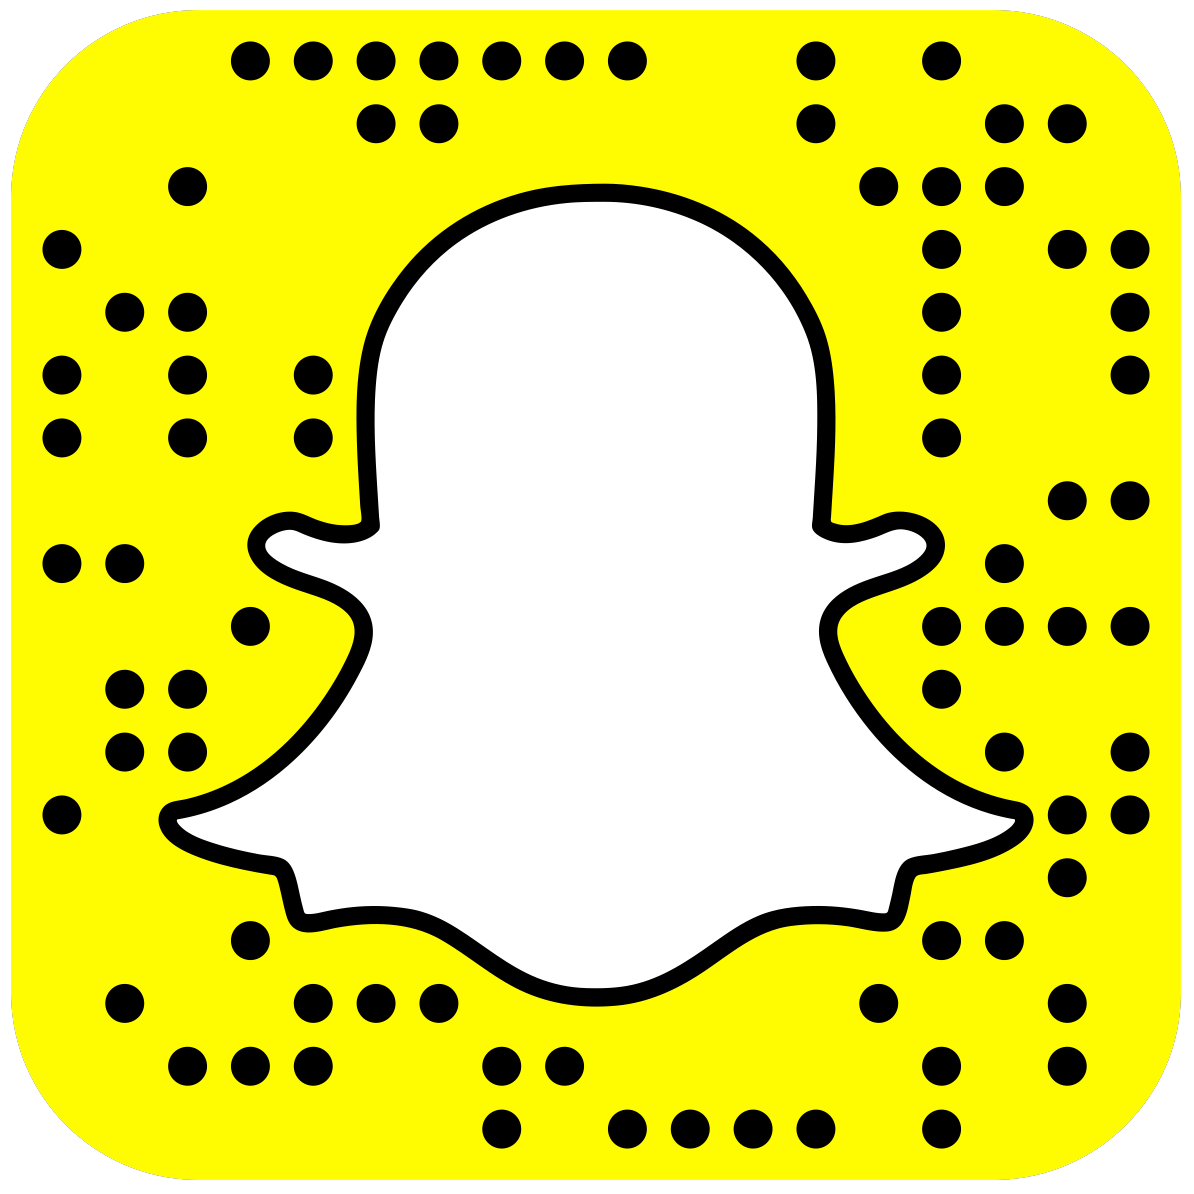 Bea Alonzo Snapchat username